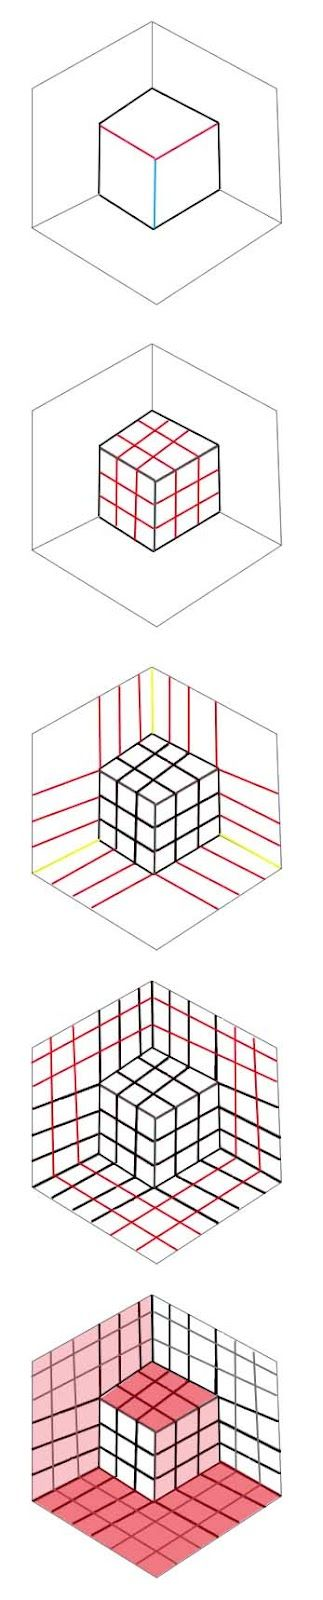 esnaf des arts: Optik yanılsama küp - öğretici